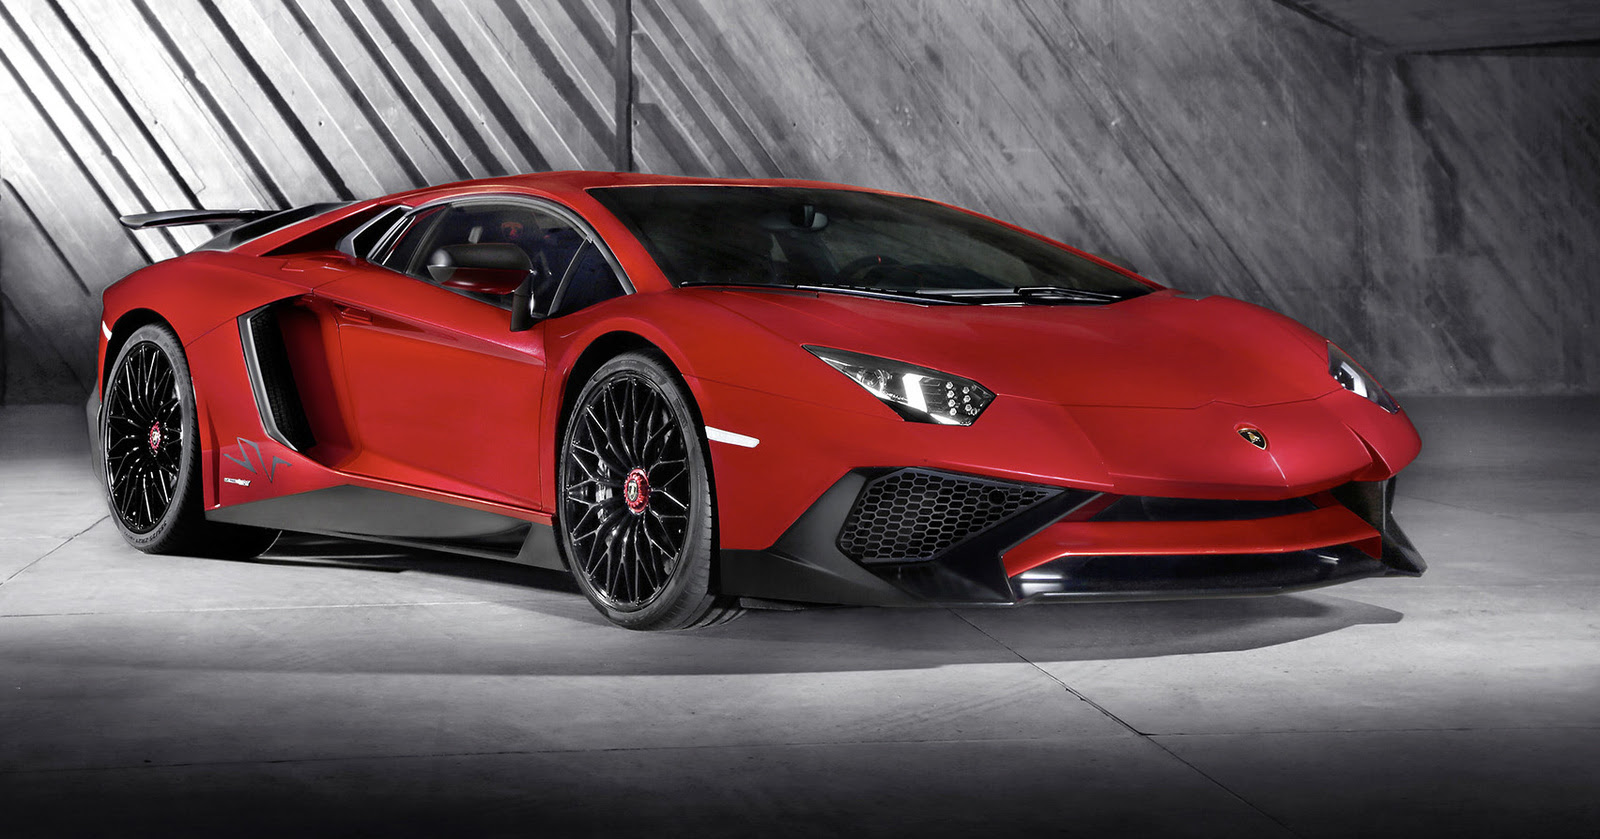 2016 Lamborghini Aventador - Review - CarGurus